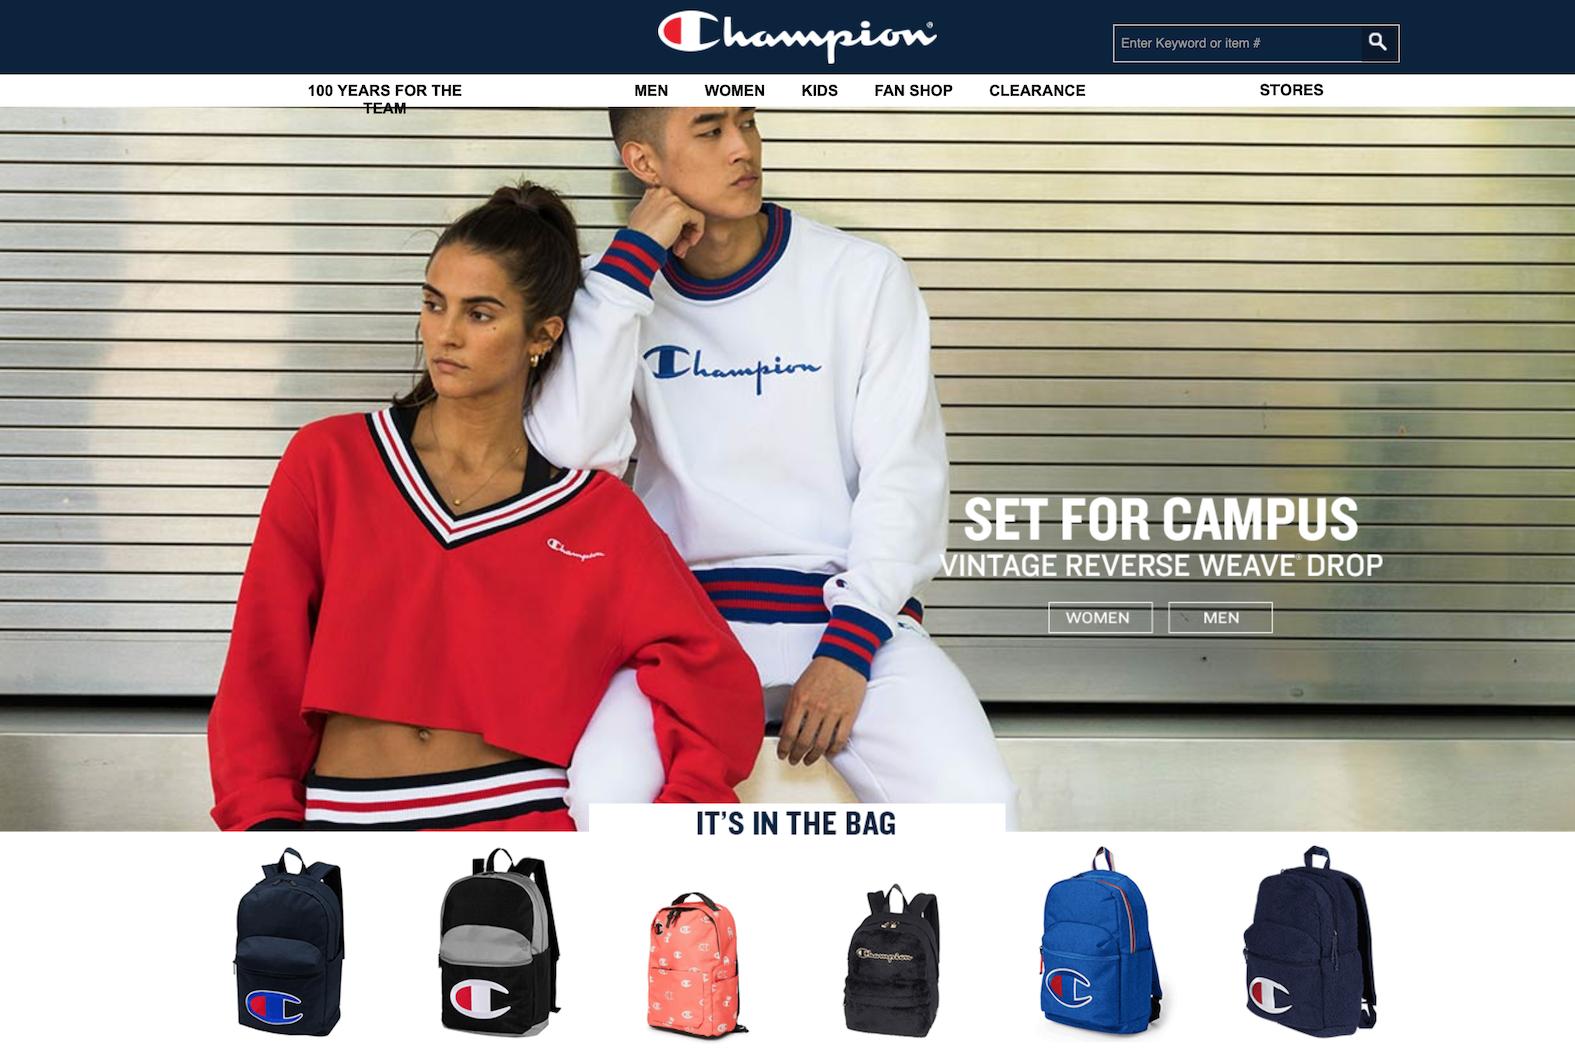 Champion 最新季度全球销售额增幅超50%,推动母公司 HanesBrands 净现金流增长一倍多